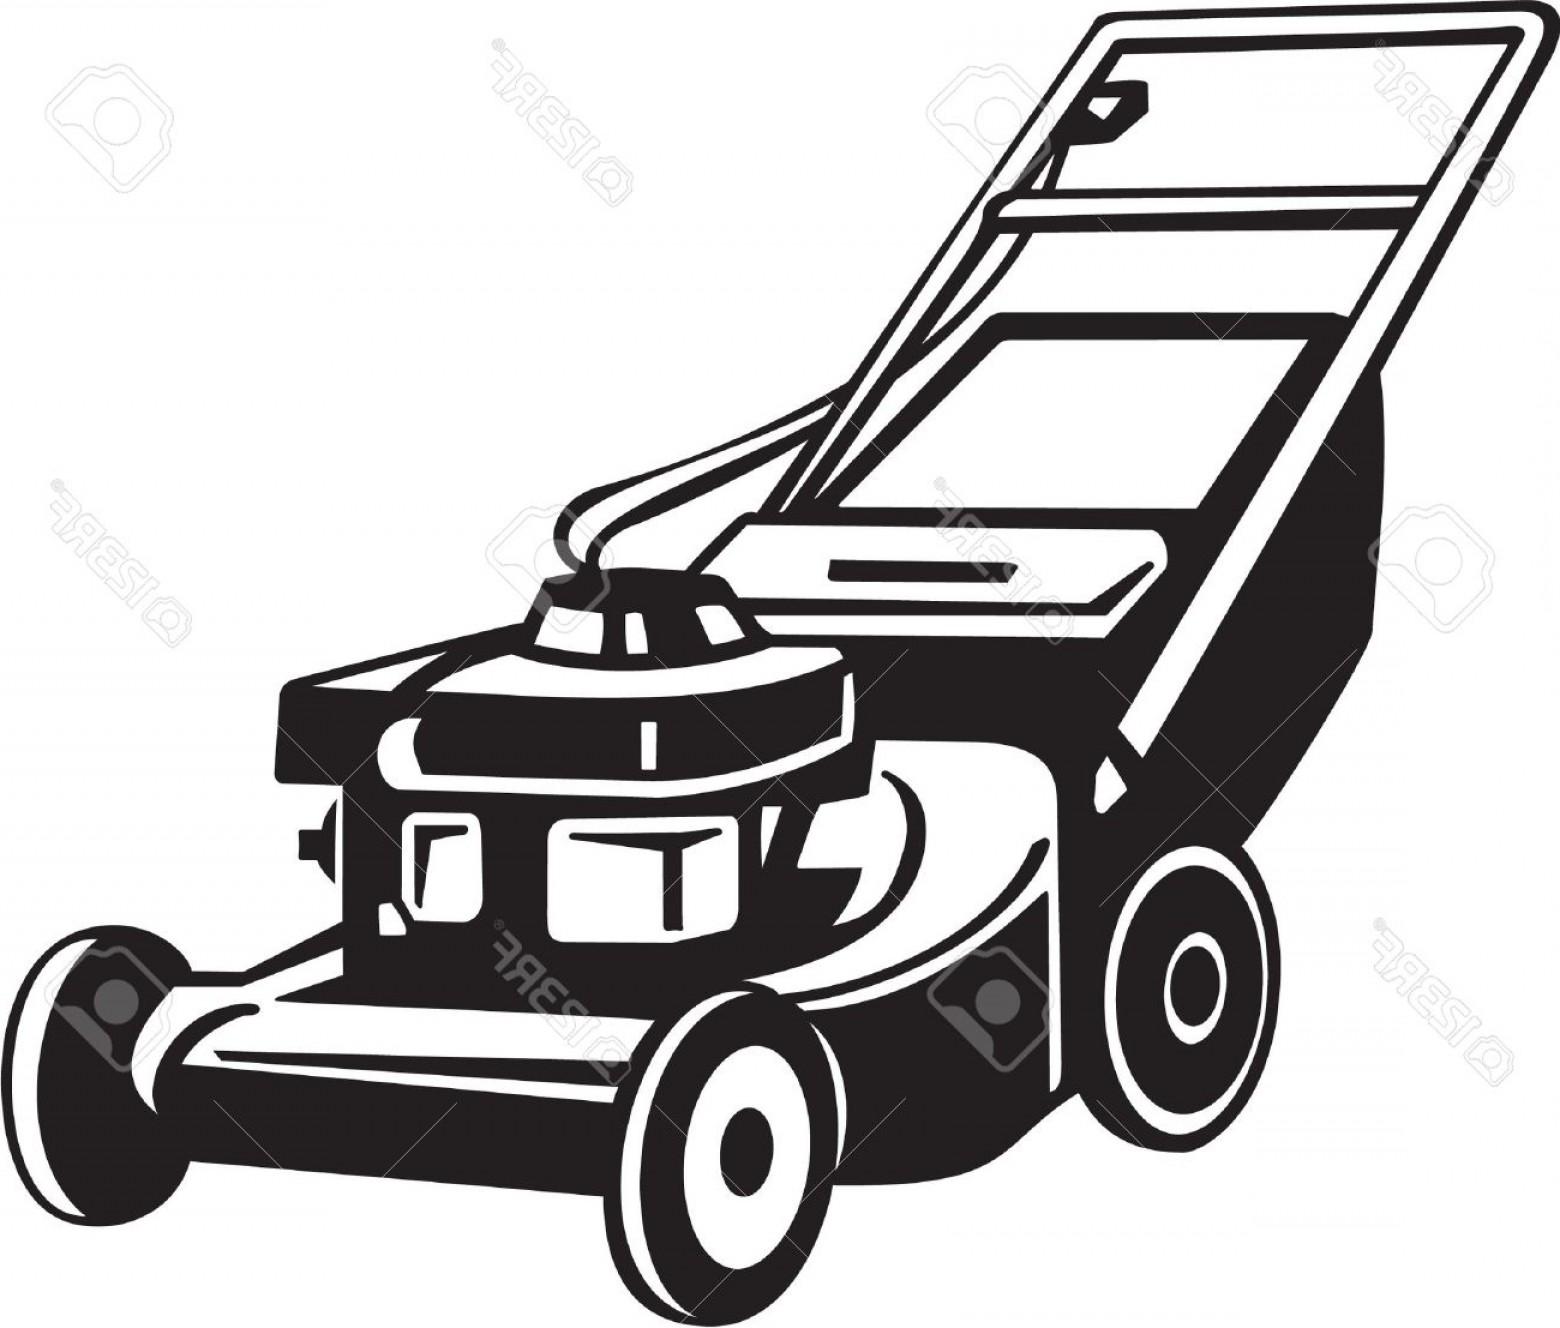 1560x1328 Photopower Lawnmower Vinyl Ready Vector Illustration Shopatcloth